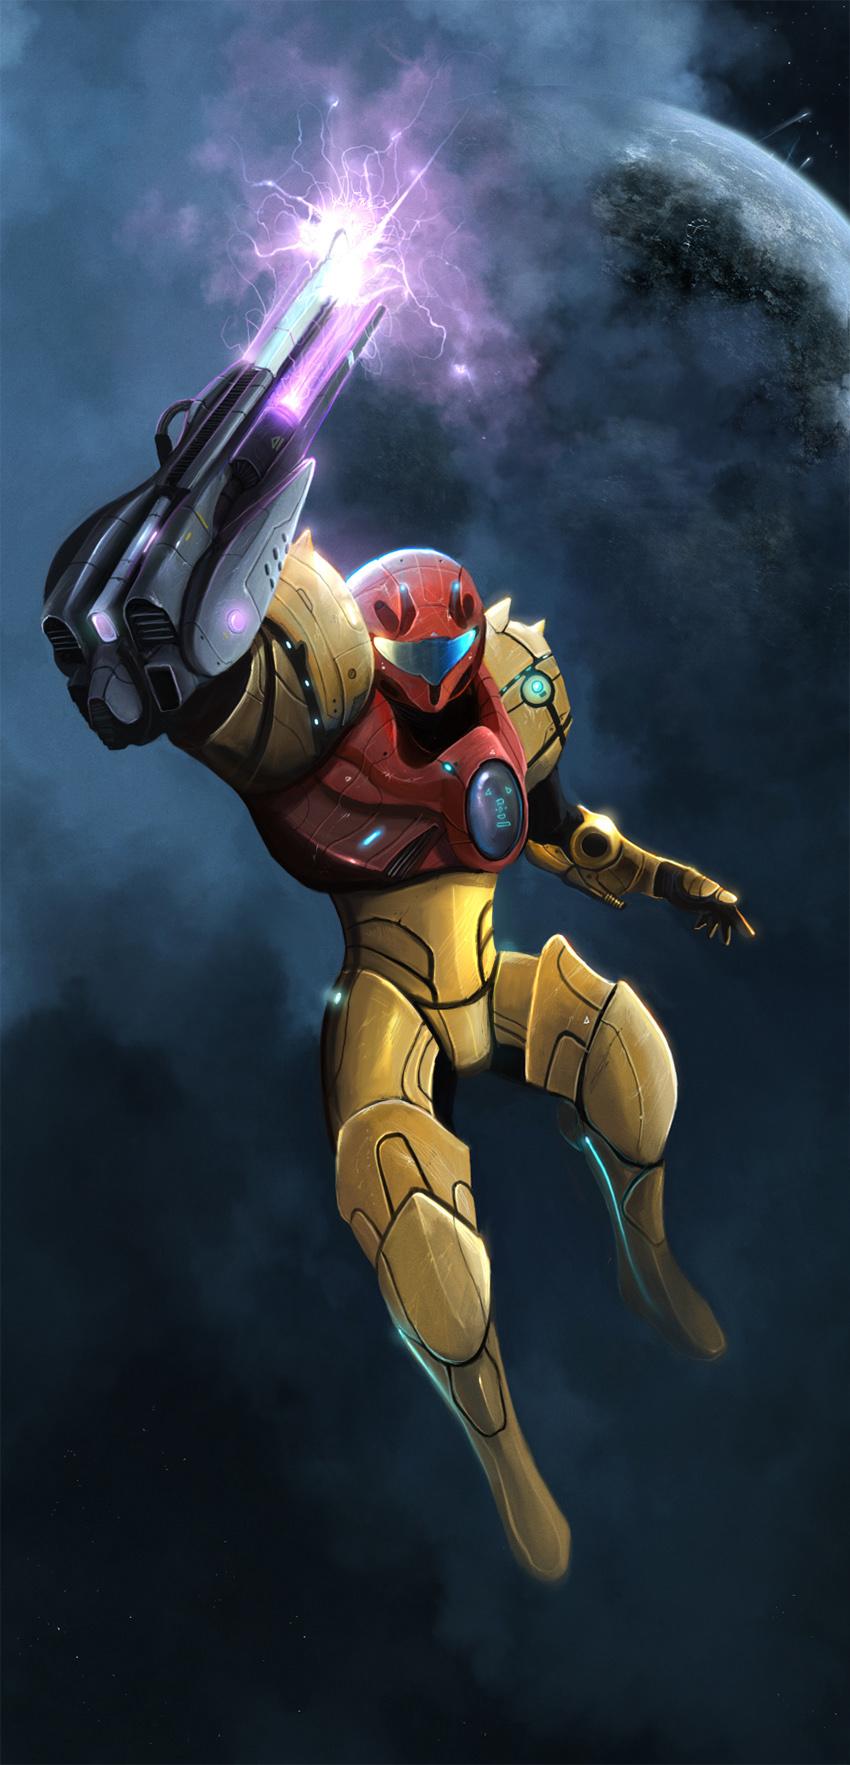 Metroid_Prime_s_Samus___by_adonihs.jpg